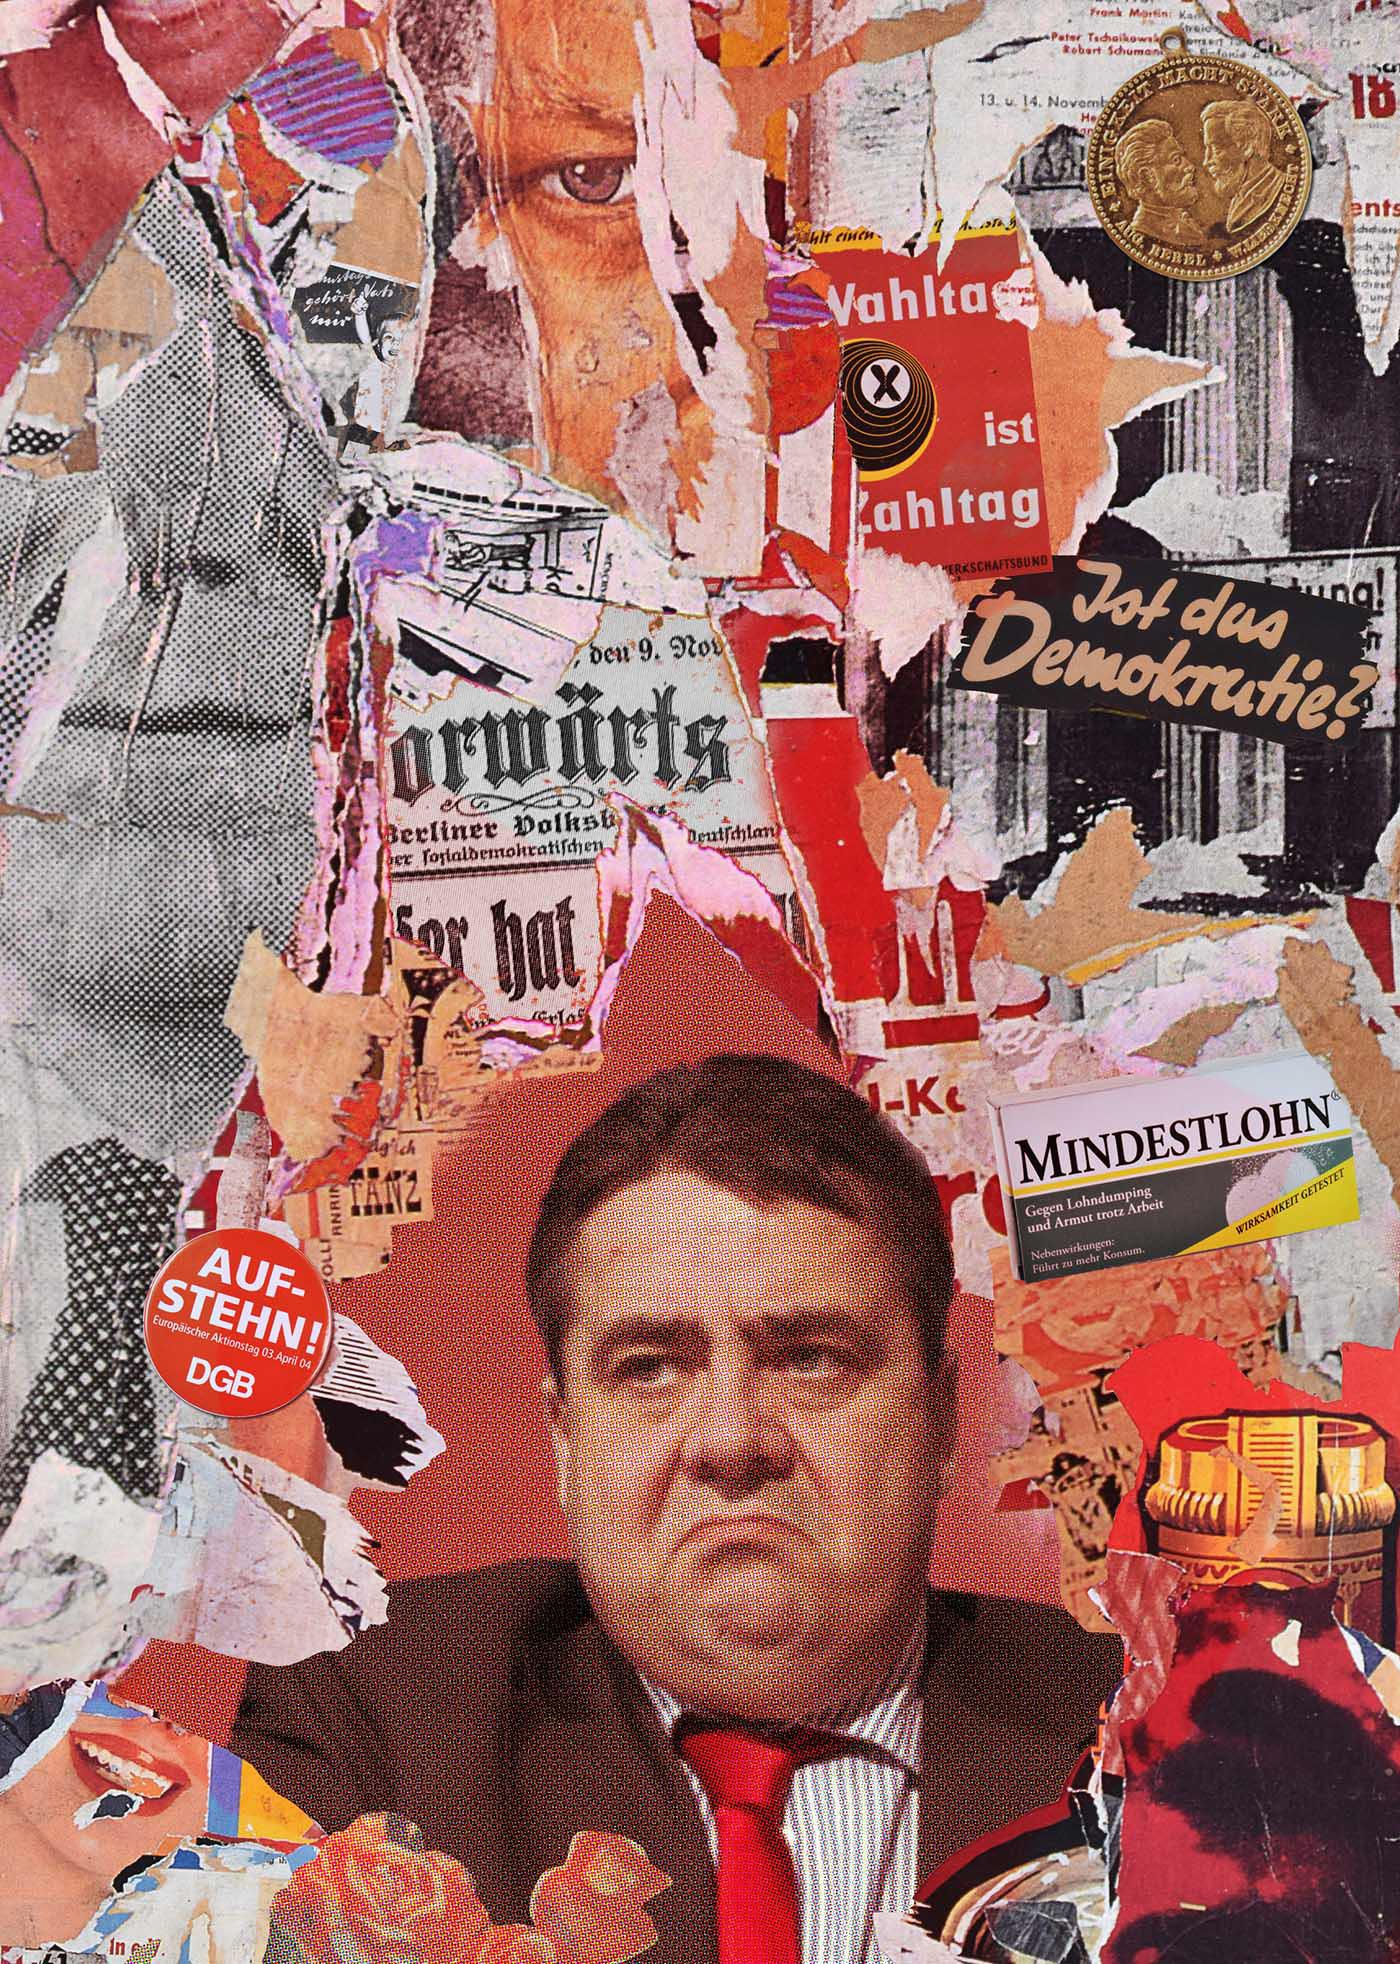 colagem collage Editorial Illustration Elections politician politics portrait berlin germany